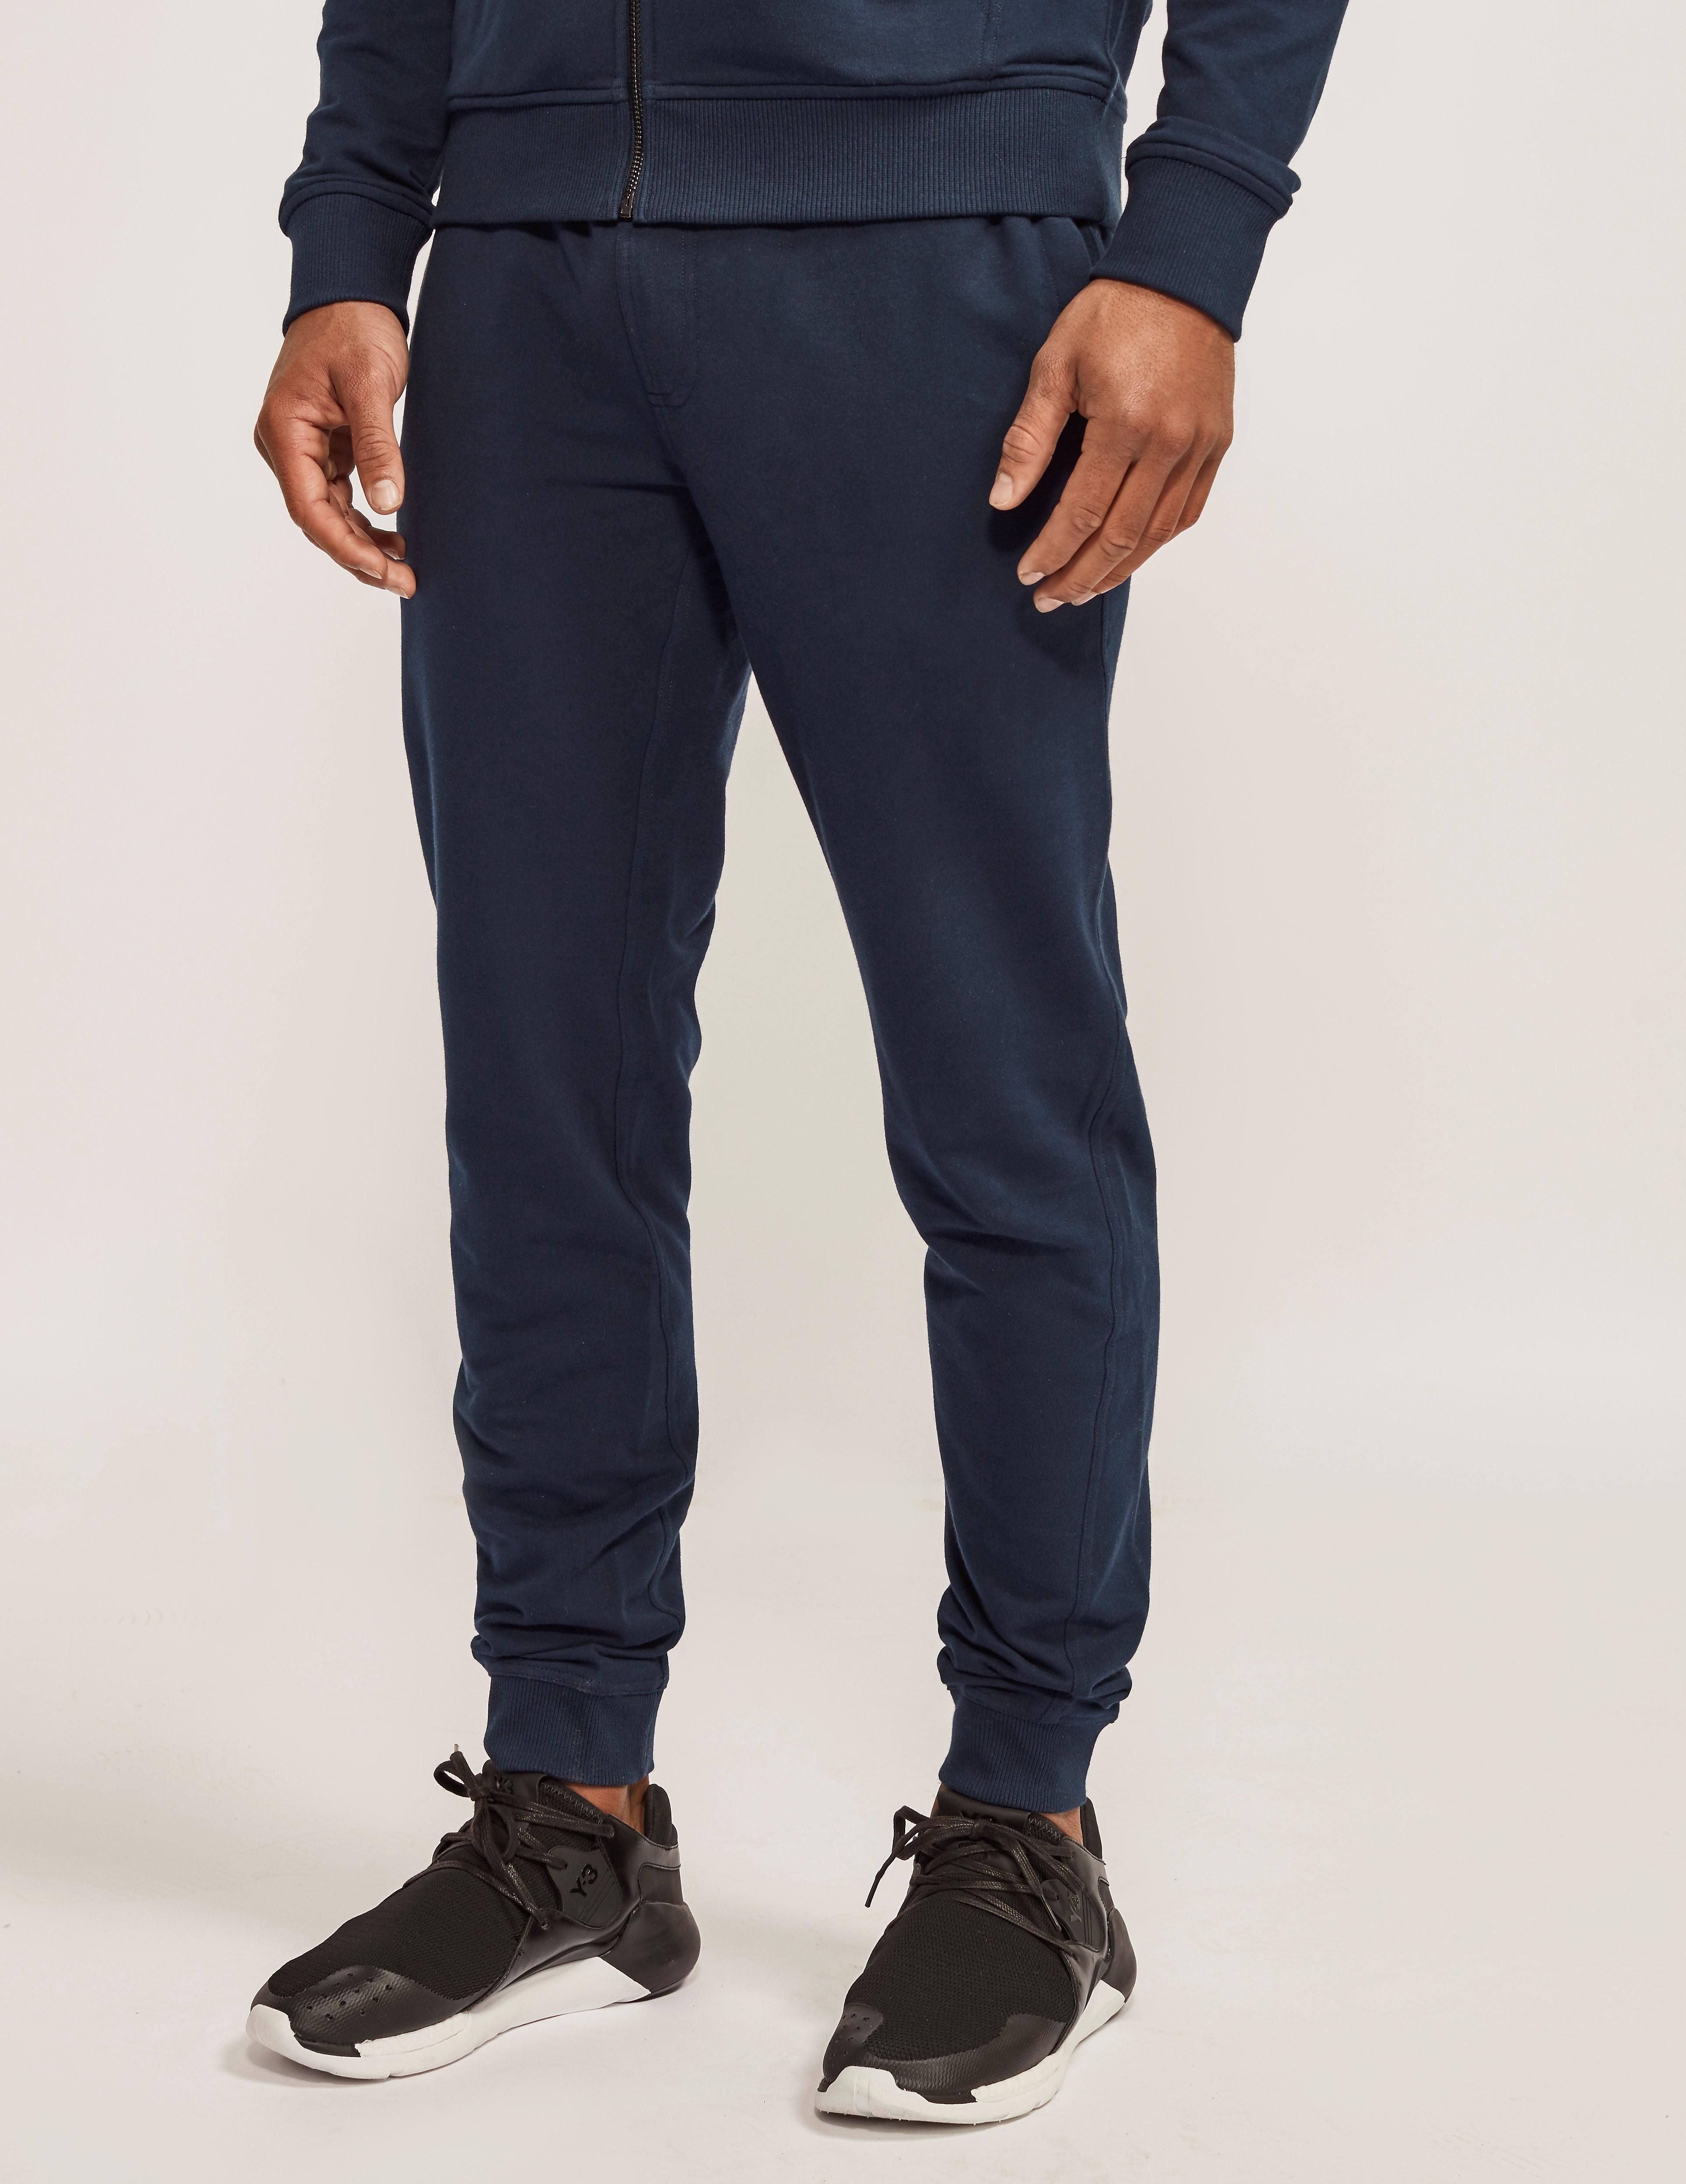 Michael Kors Stretch Fleece Pant